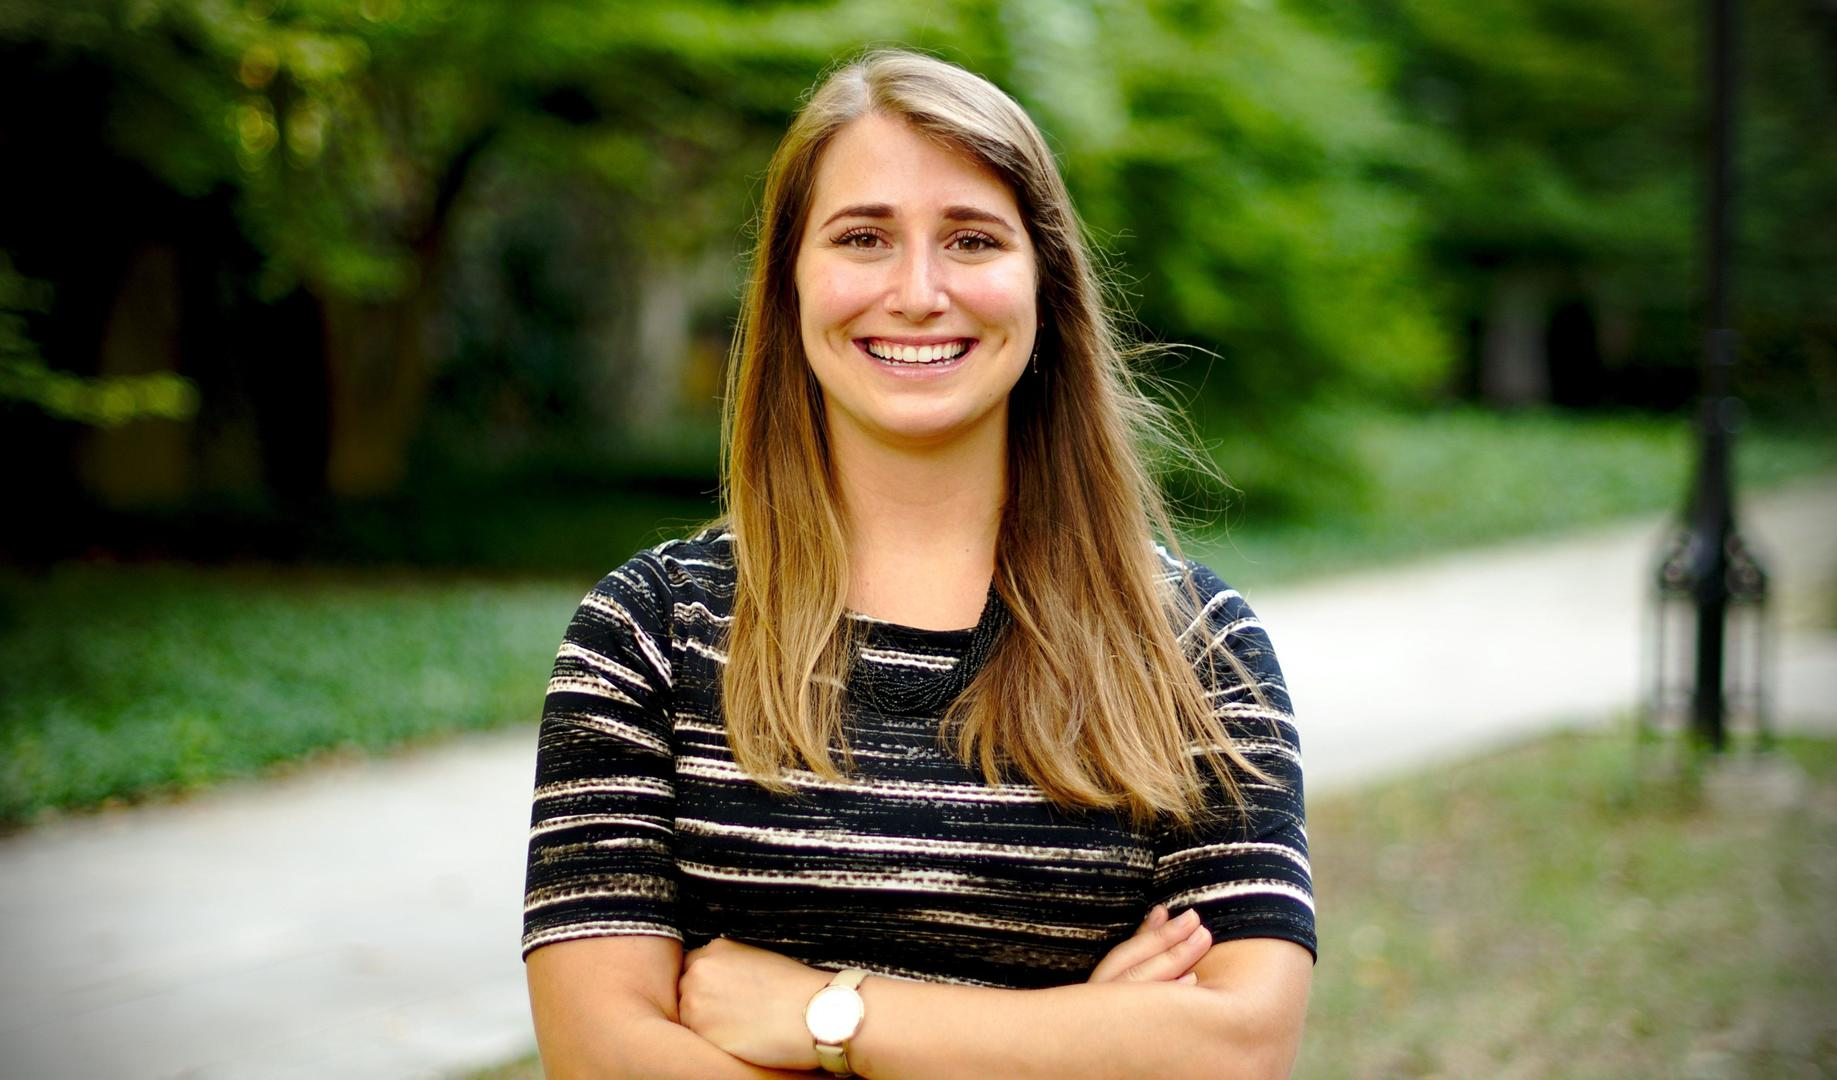 Karlyn J. Gorski, Department of Sociology | W. Allison Davis Research Award Recipient, 2020-2021